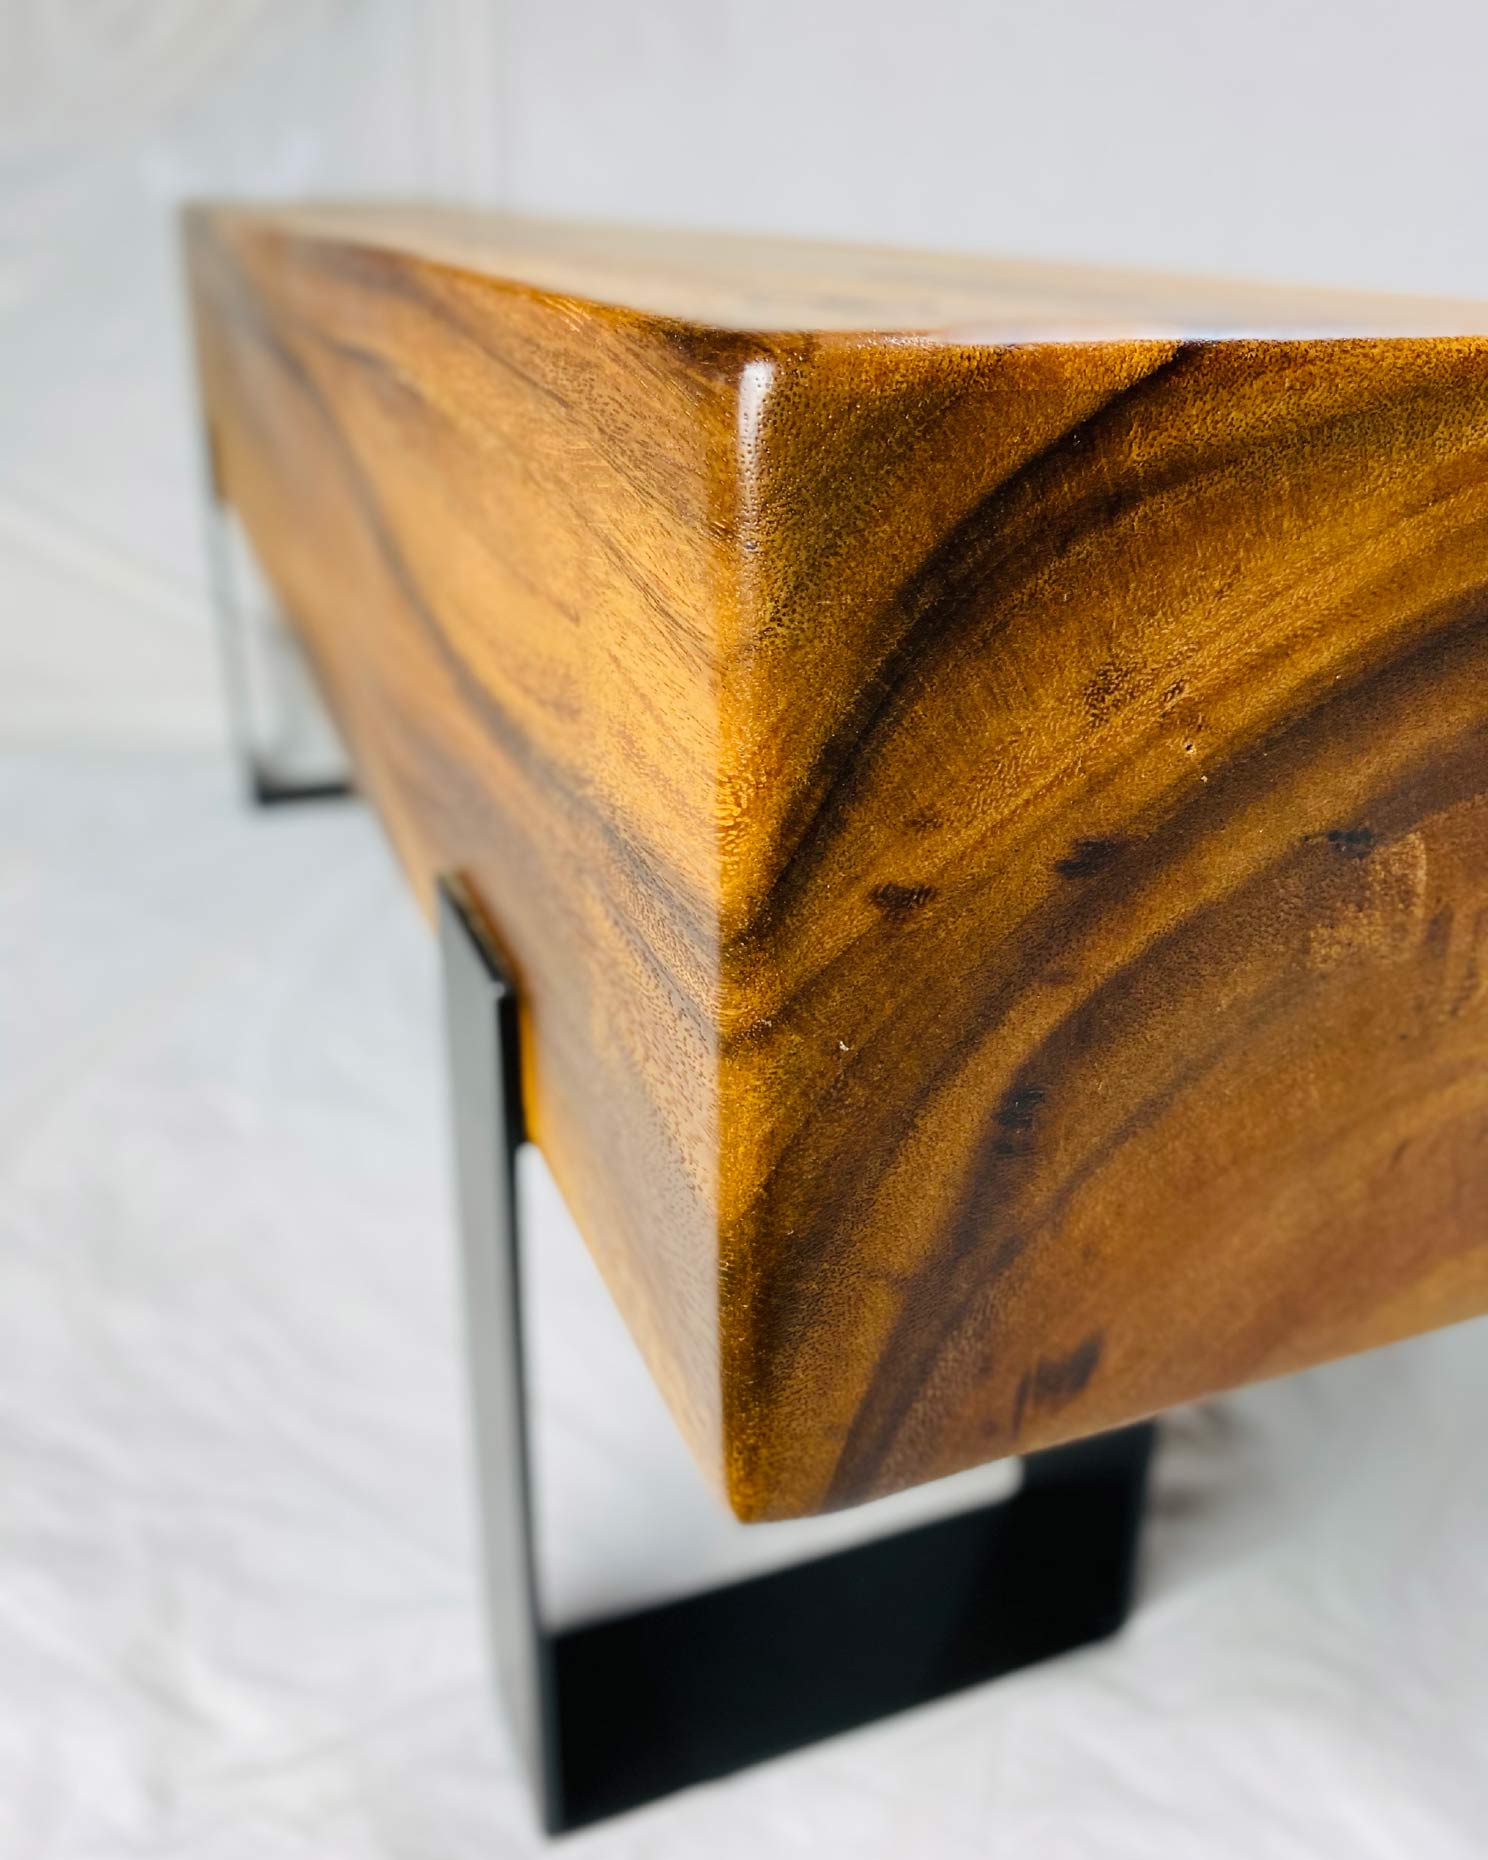 Logan suar wood bench